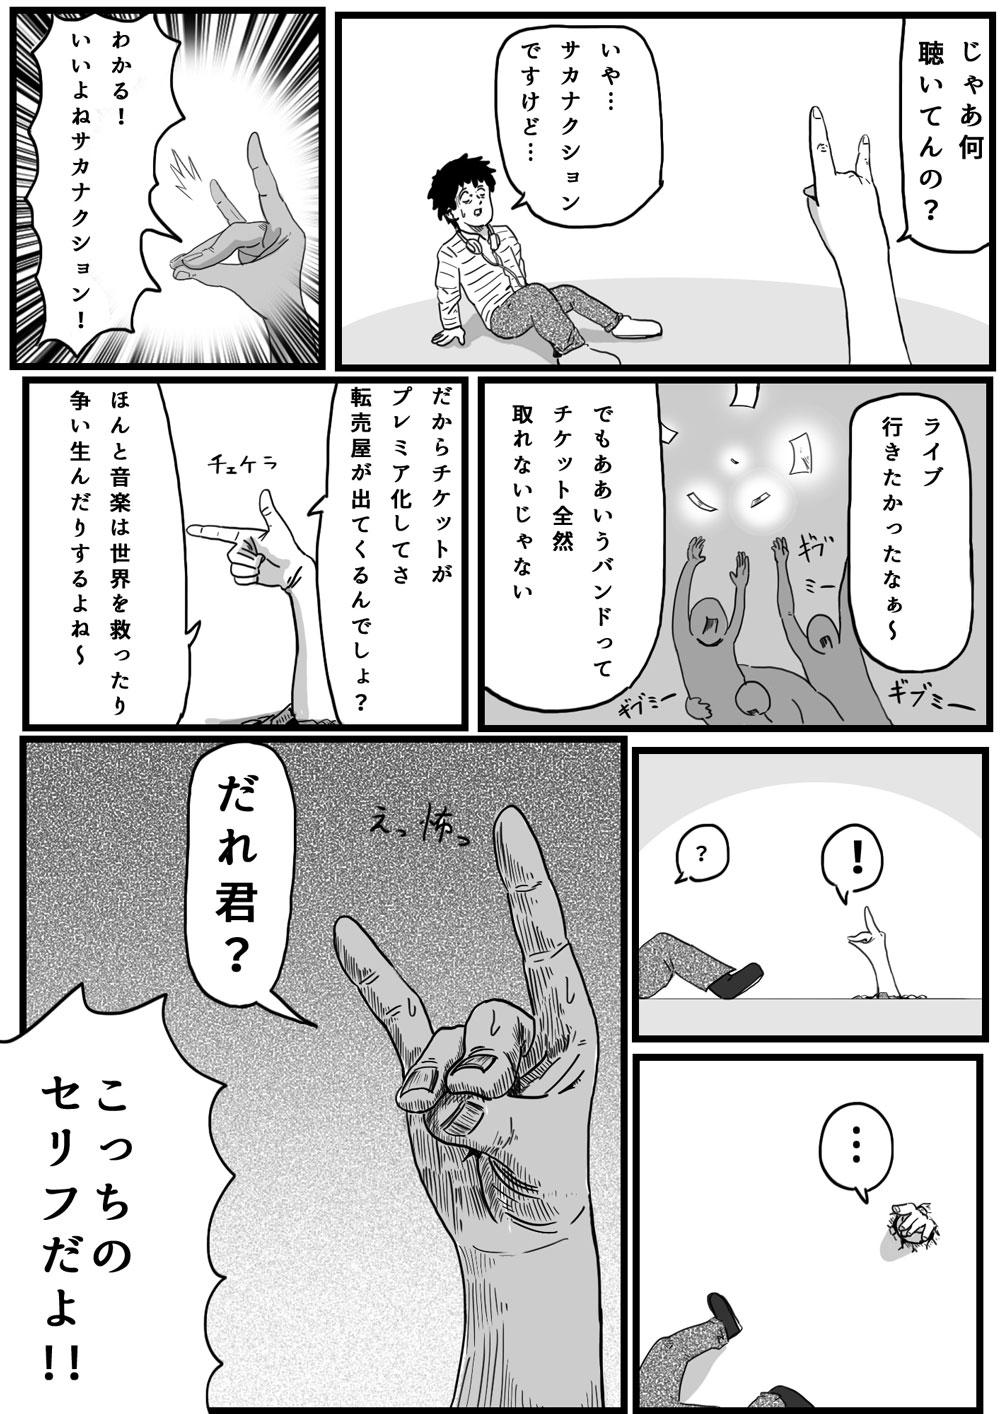 arnolds-hasegawa-001-4